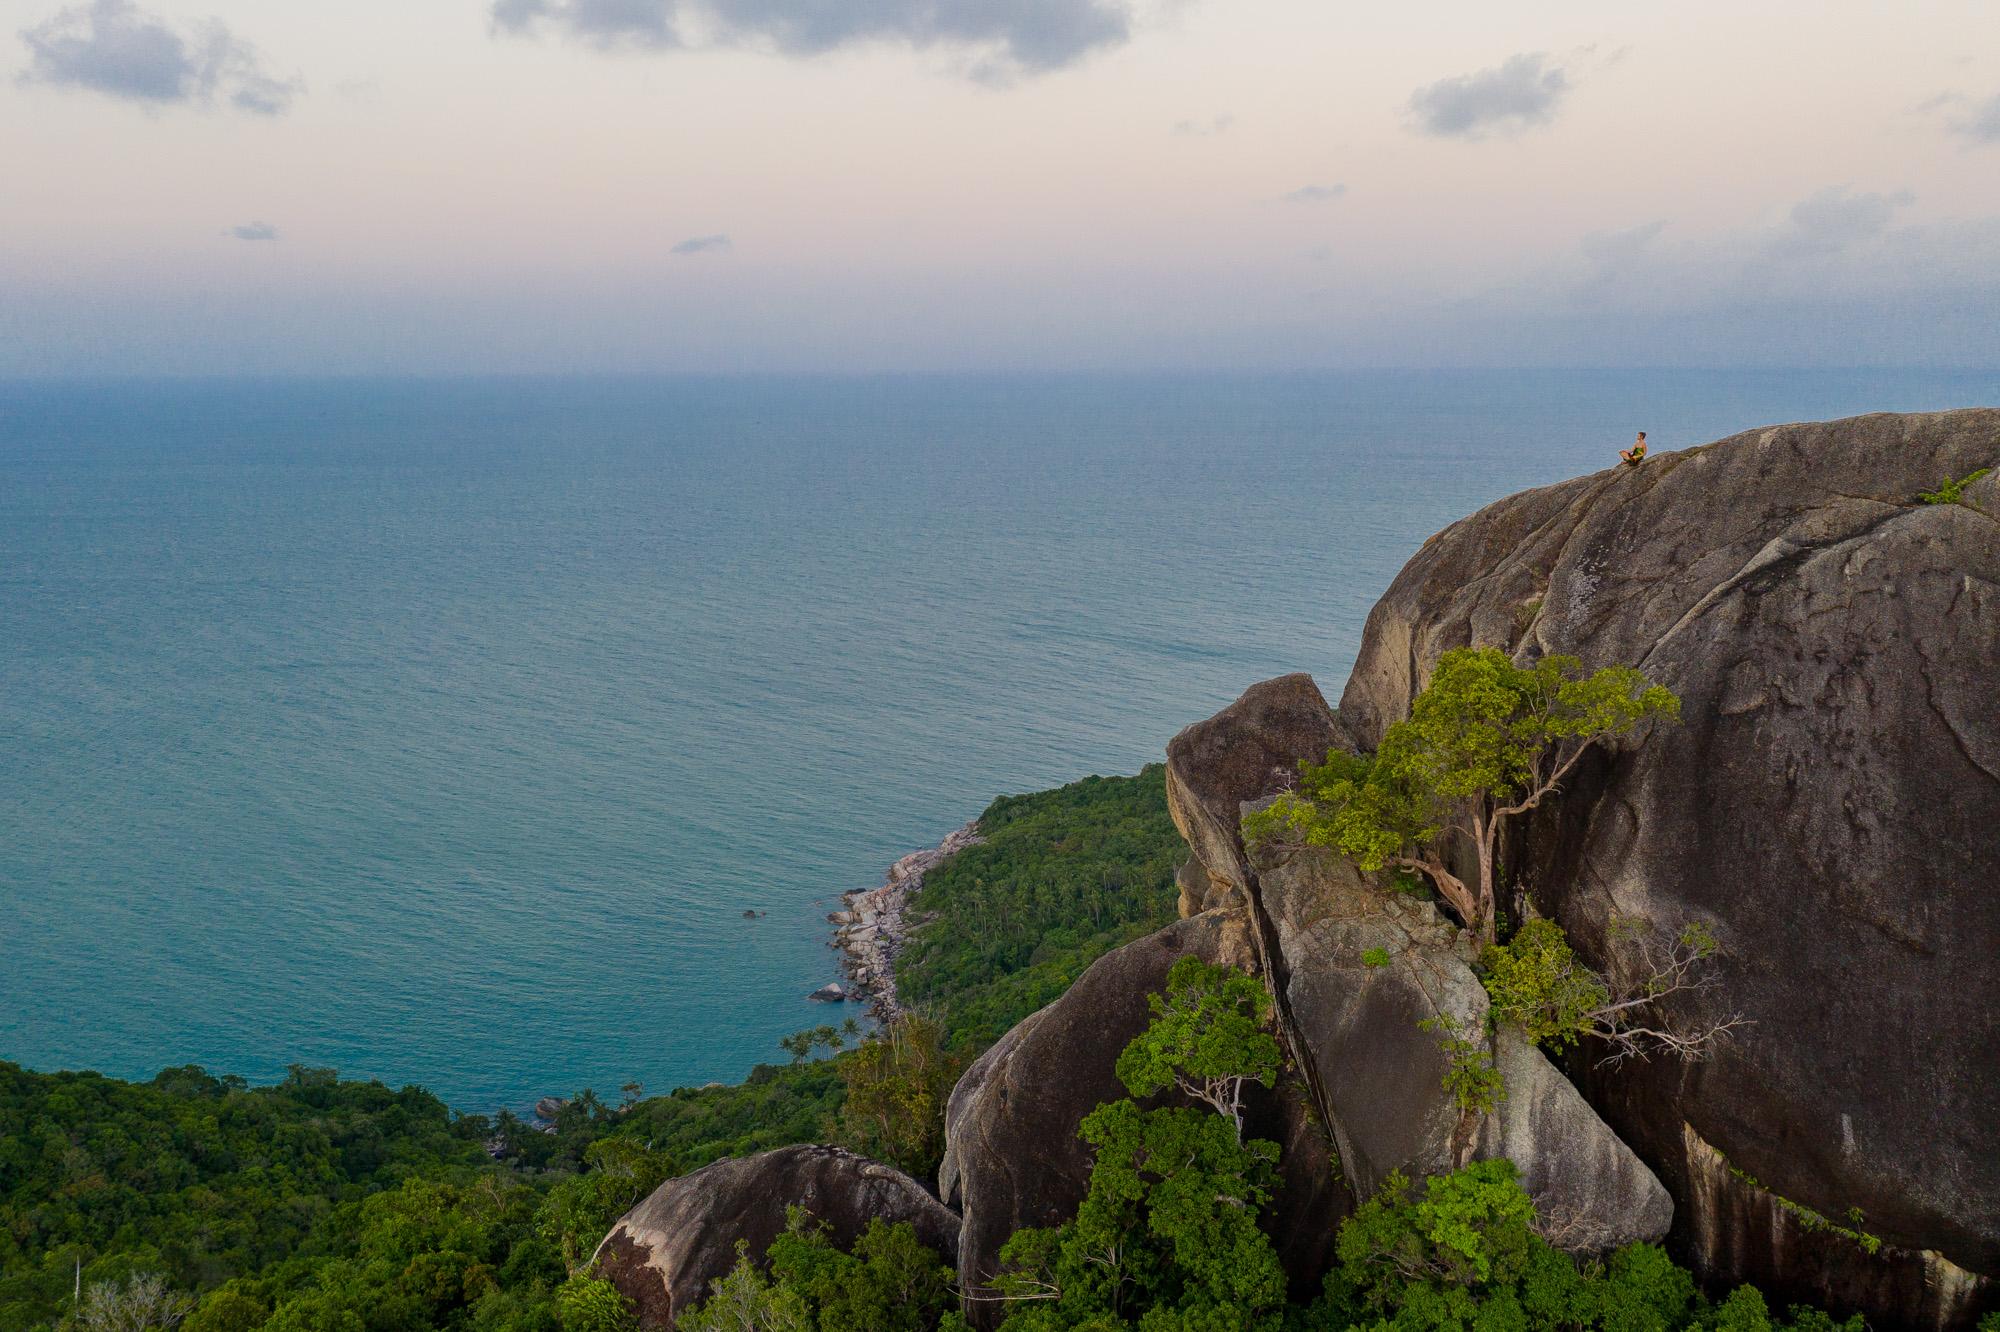 DJI Mavic 2 Pro Drohne in Thailand im Test